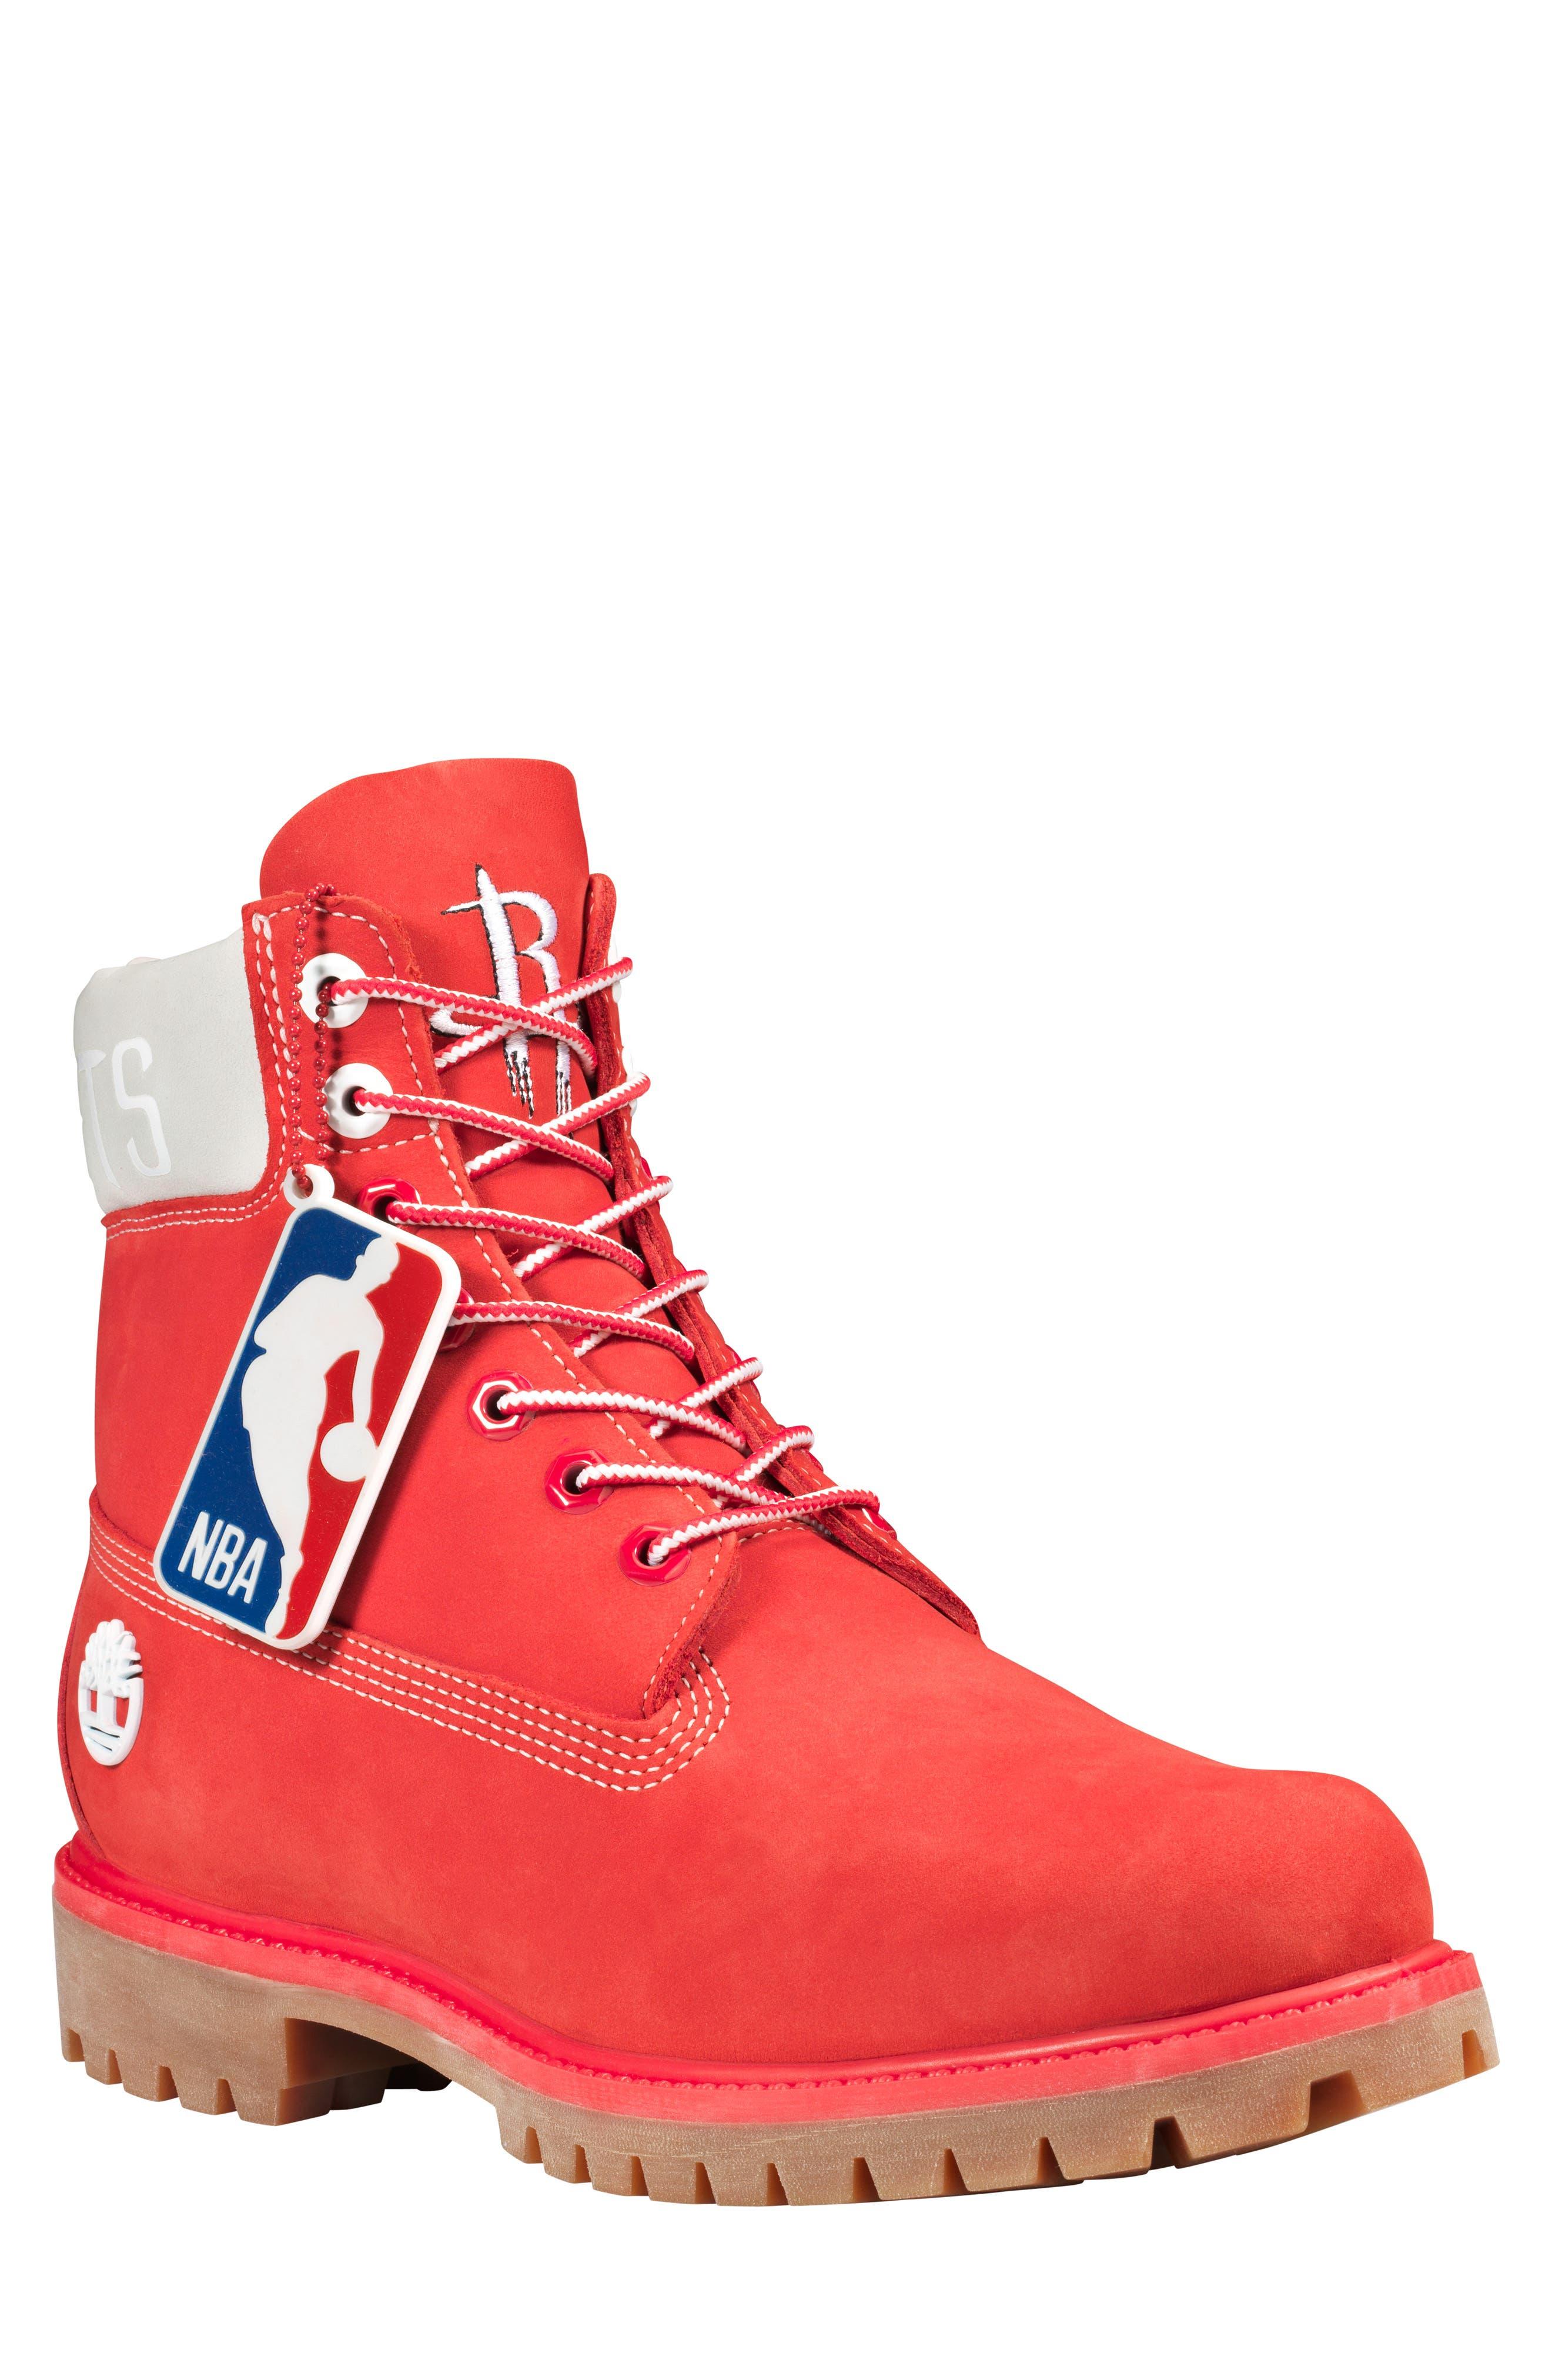 Timberland Houston Rockets Plain Toe Boot, Red